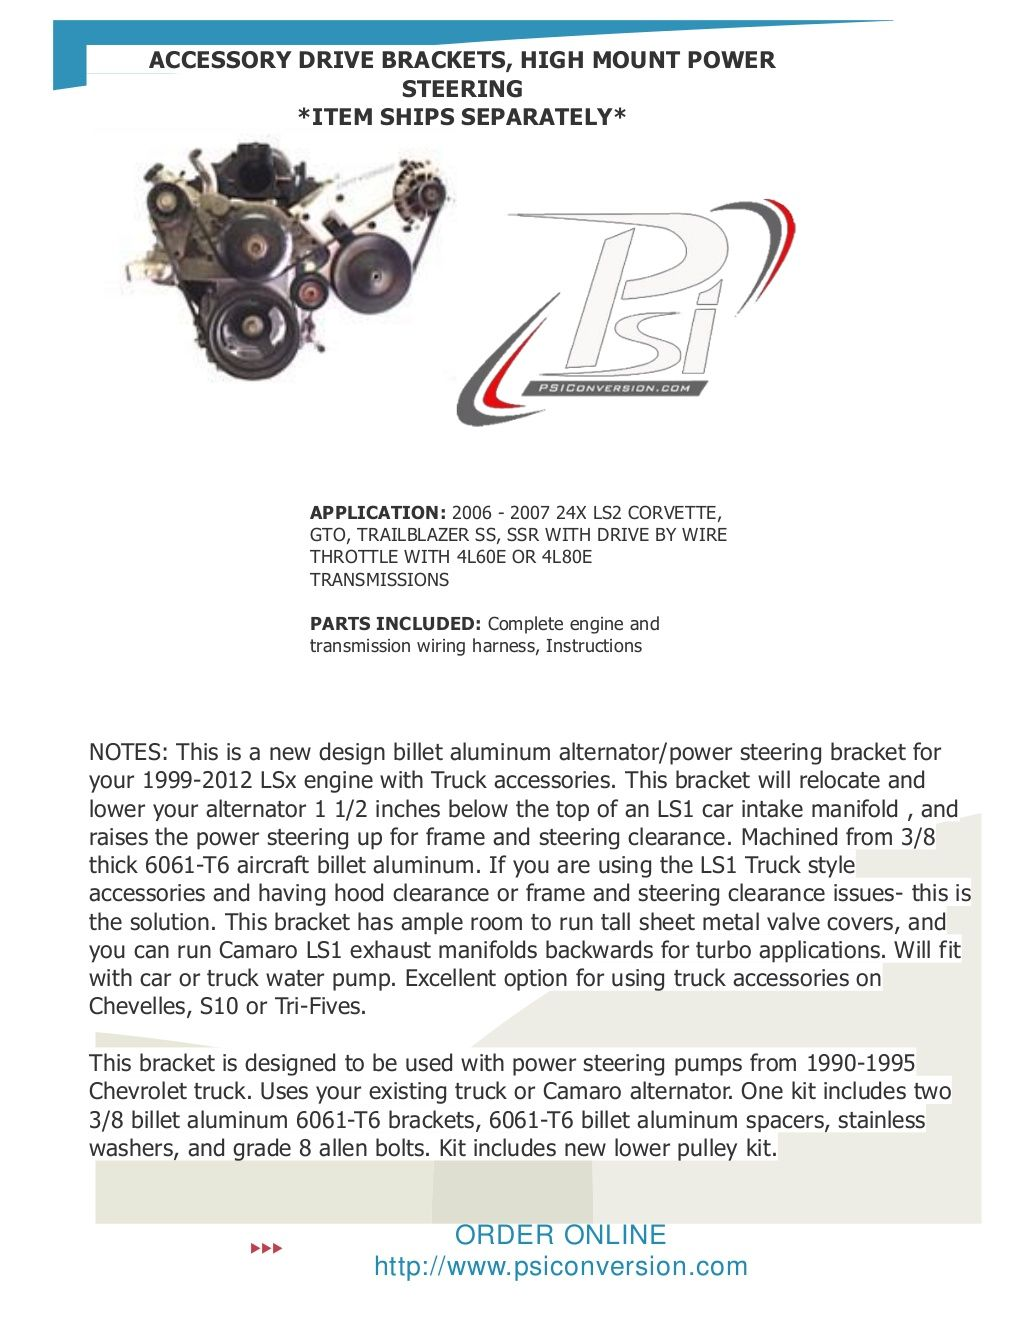 accessory drive brackets high mount power steering by psiconversion via slideshare trailblazer ss truck [ 1024 x 1326 Pixel ]